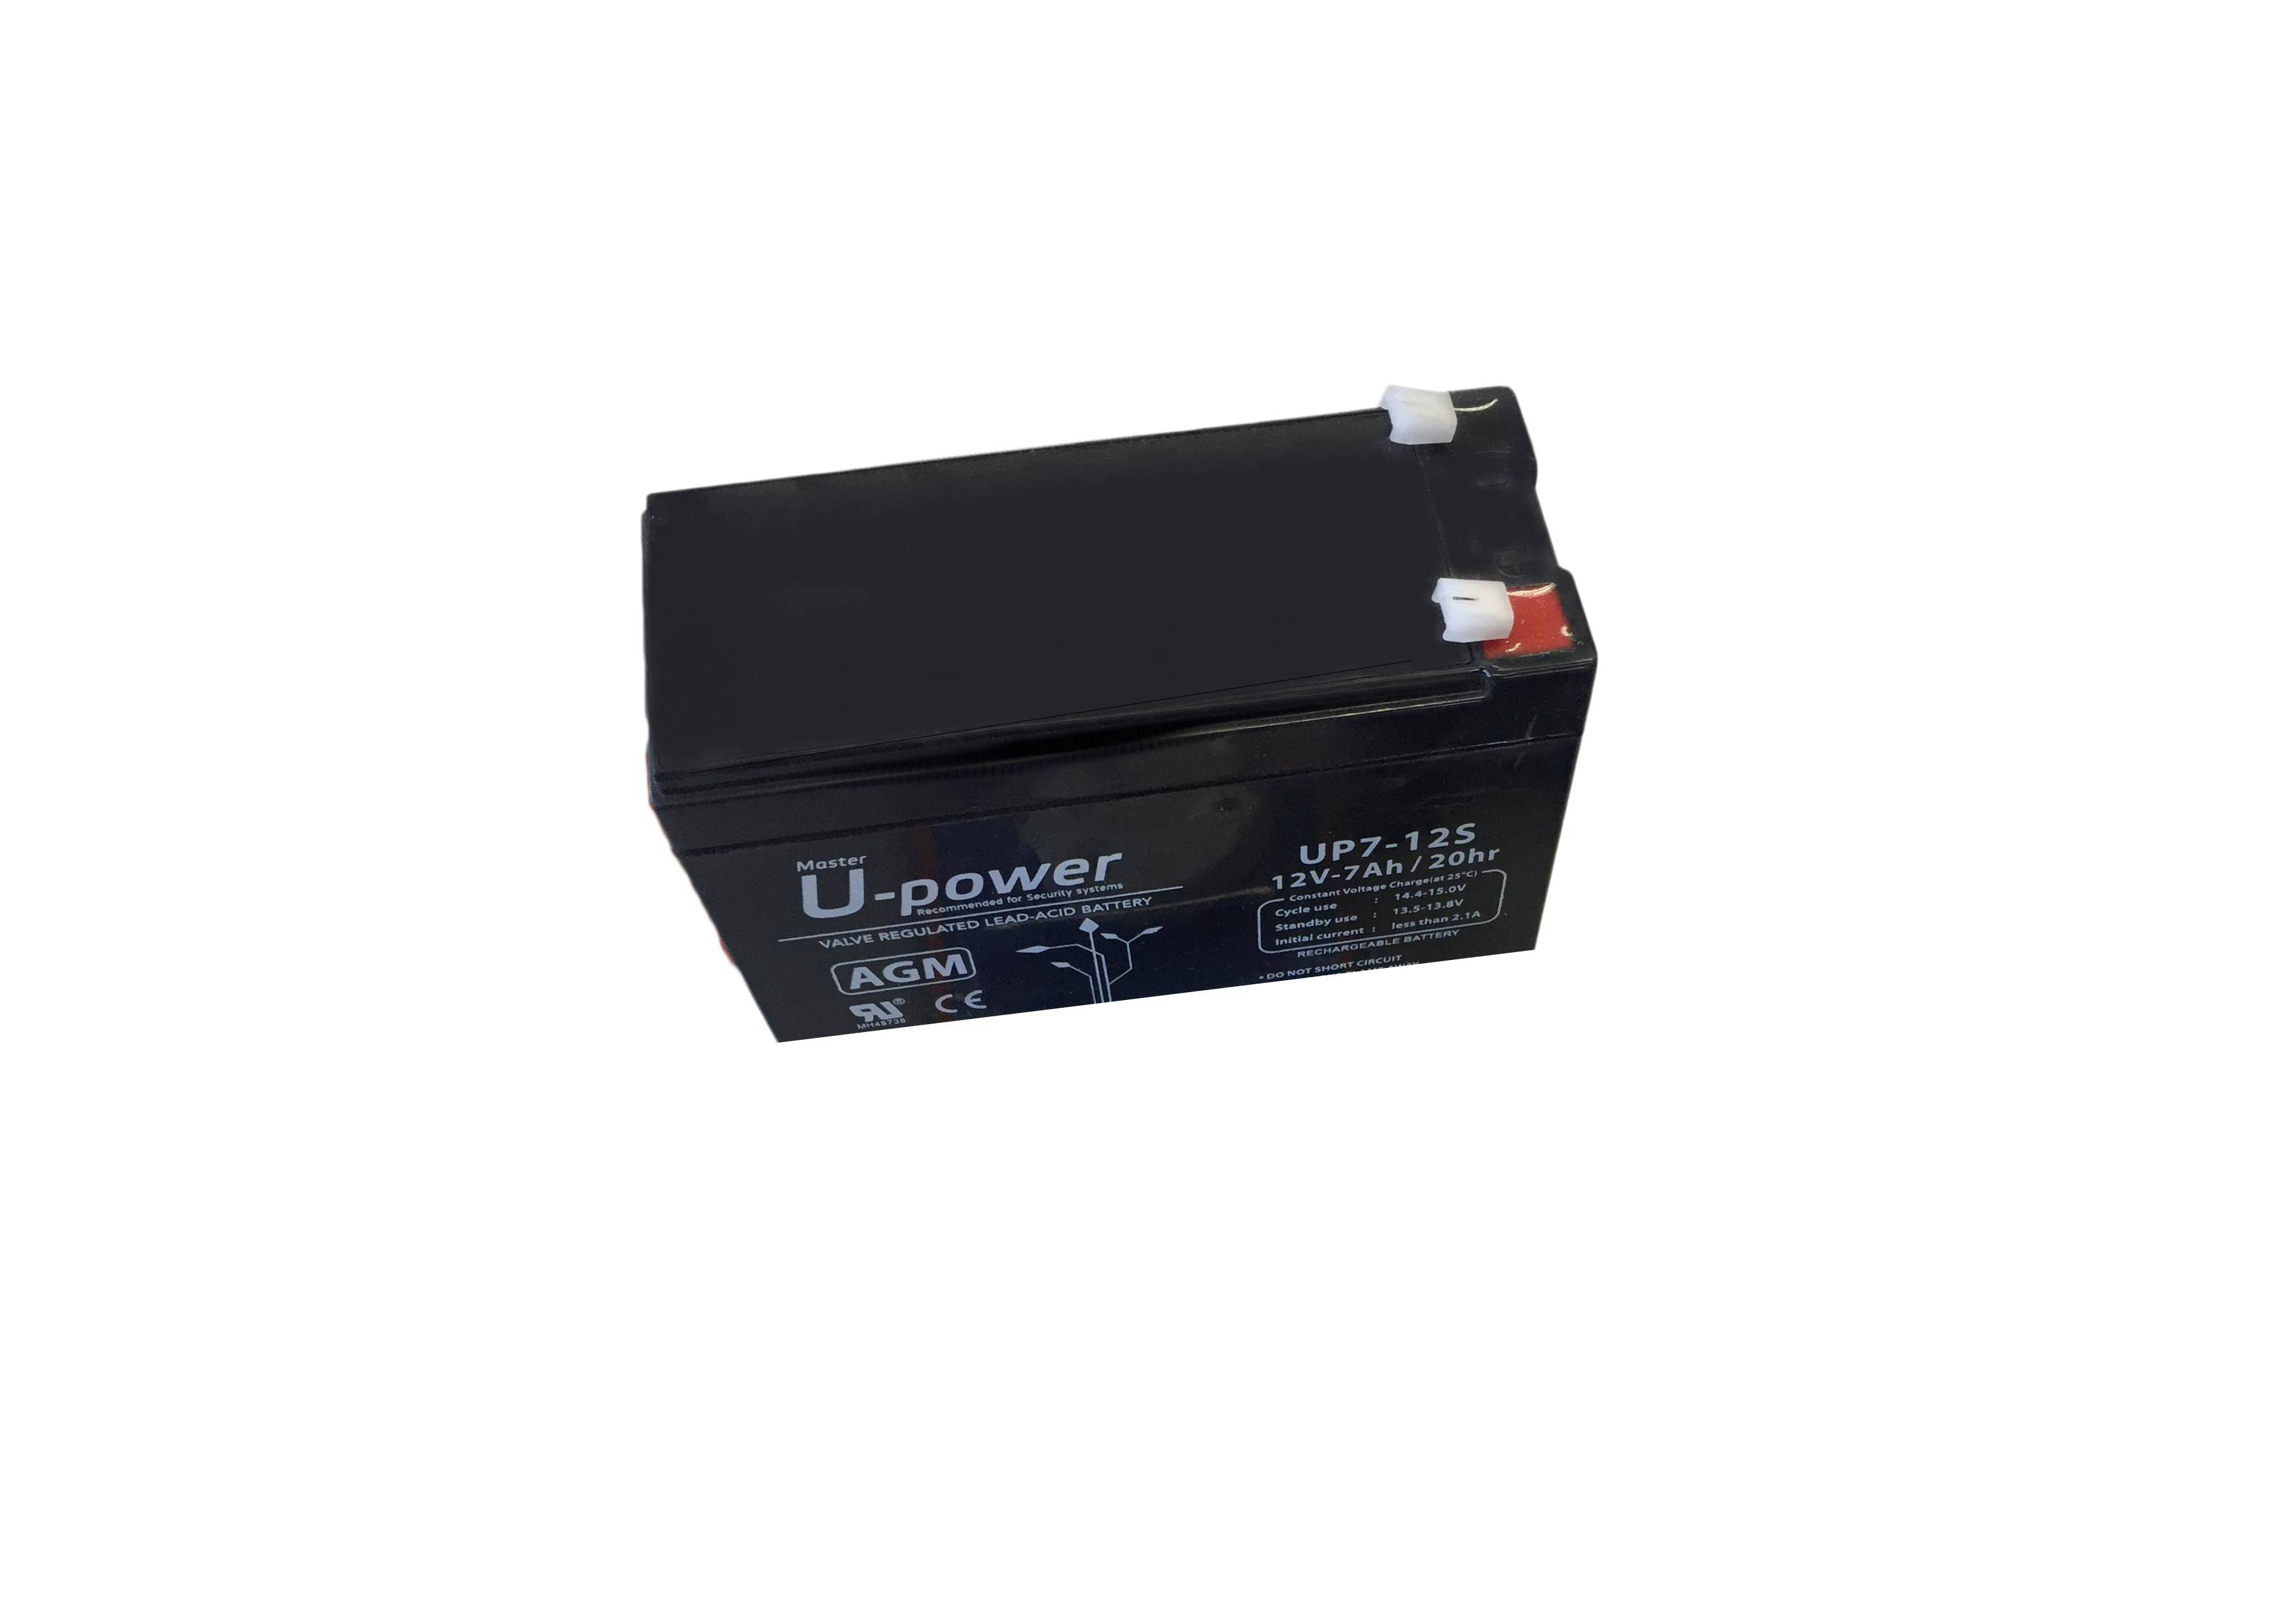 Bateria para Sonda, Chart Plotters y GPS 12V - 7AH - 20hr